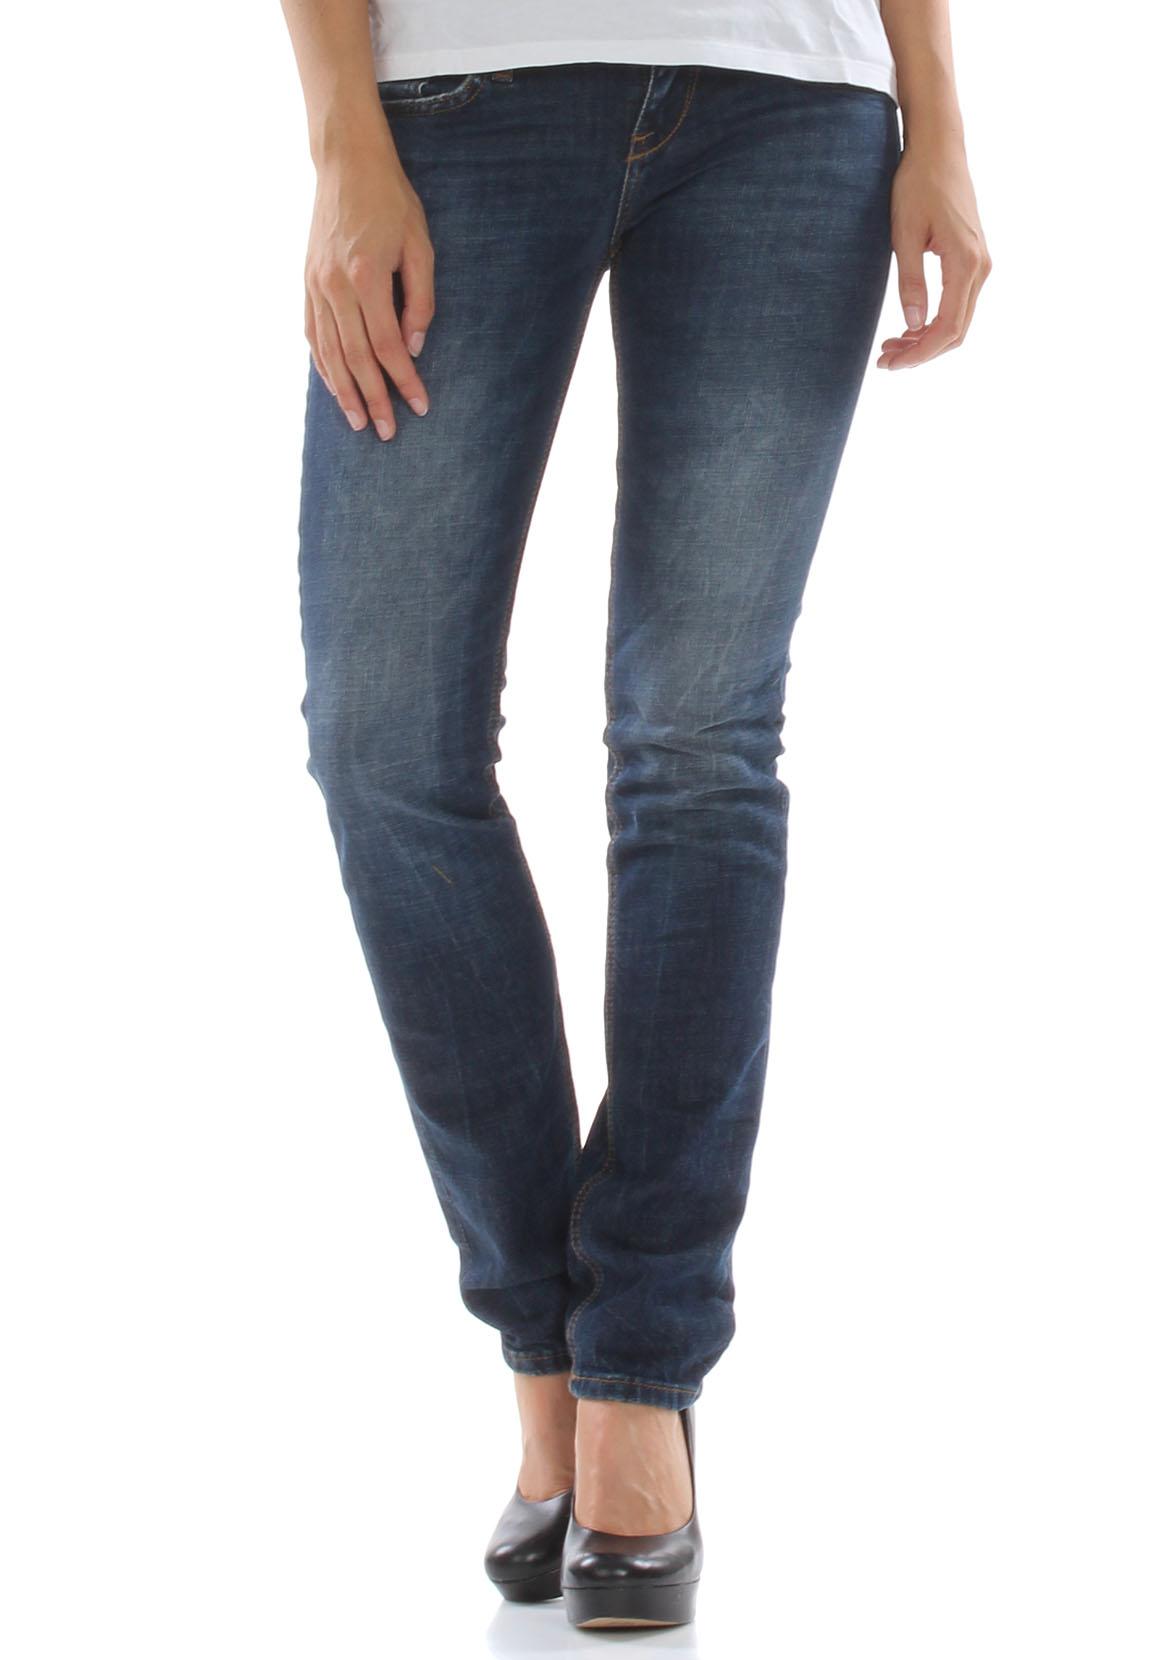 ltb jeans women aspen lasson wash ebay. Black Bedroom Furniture Sets. Home Design Ideas